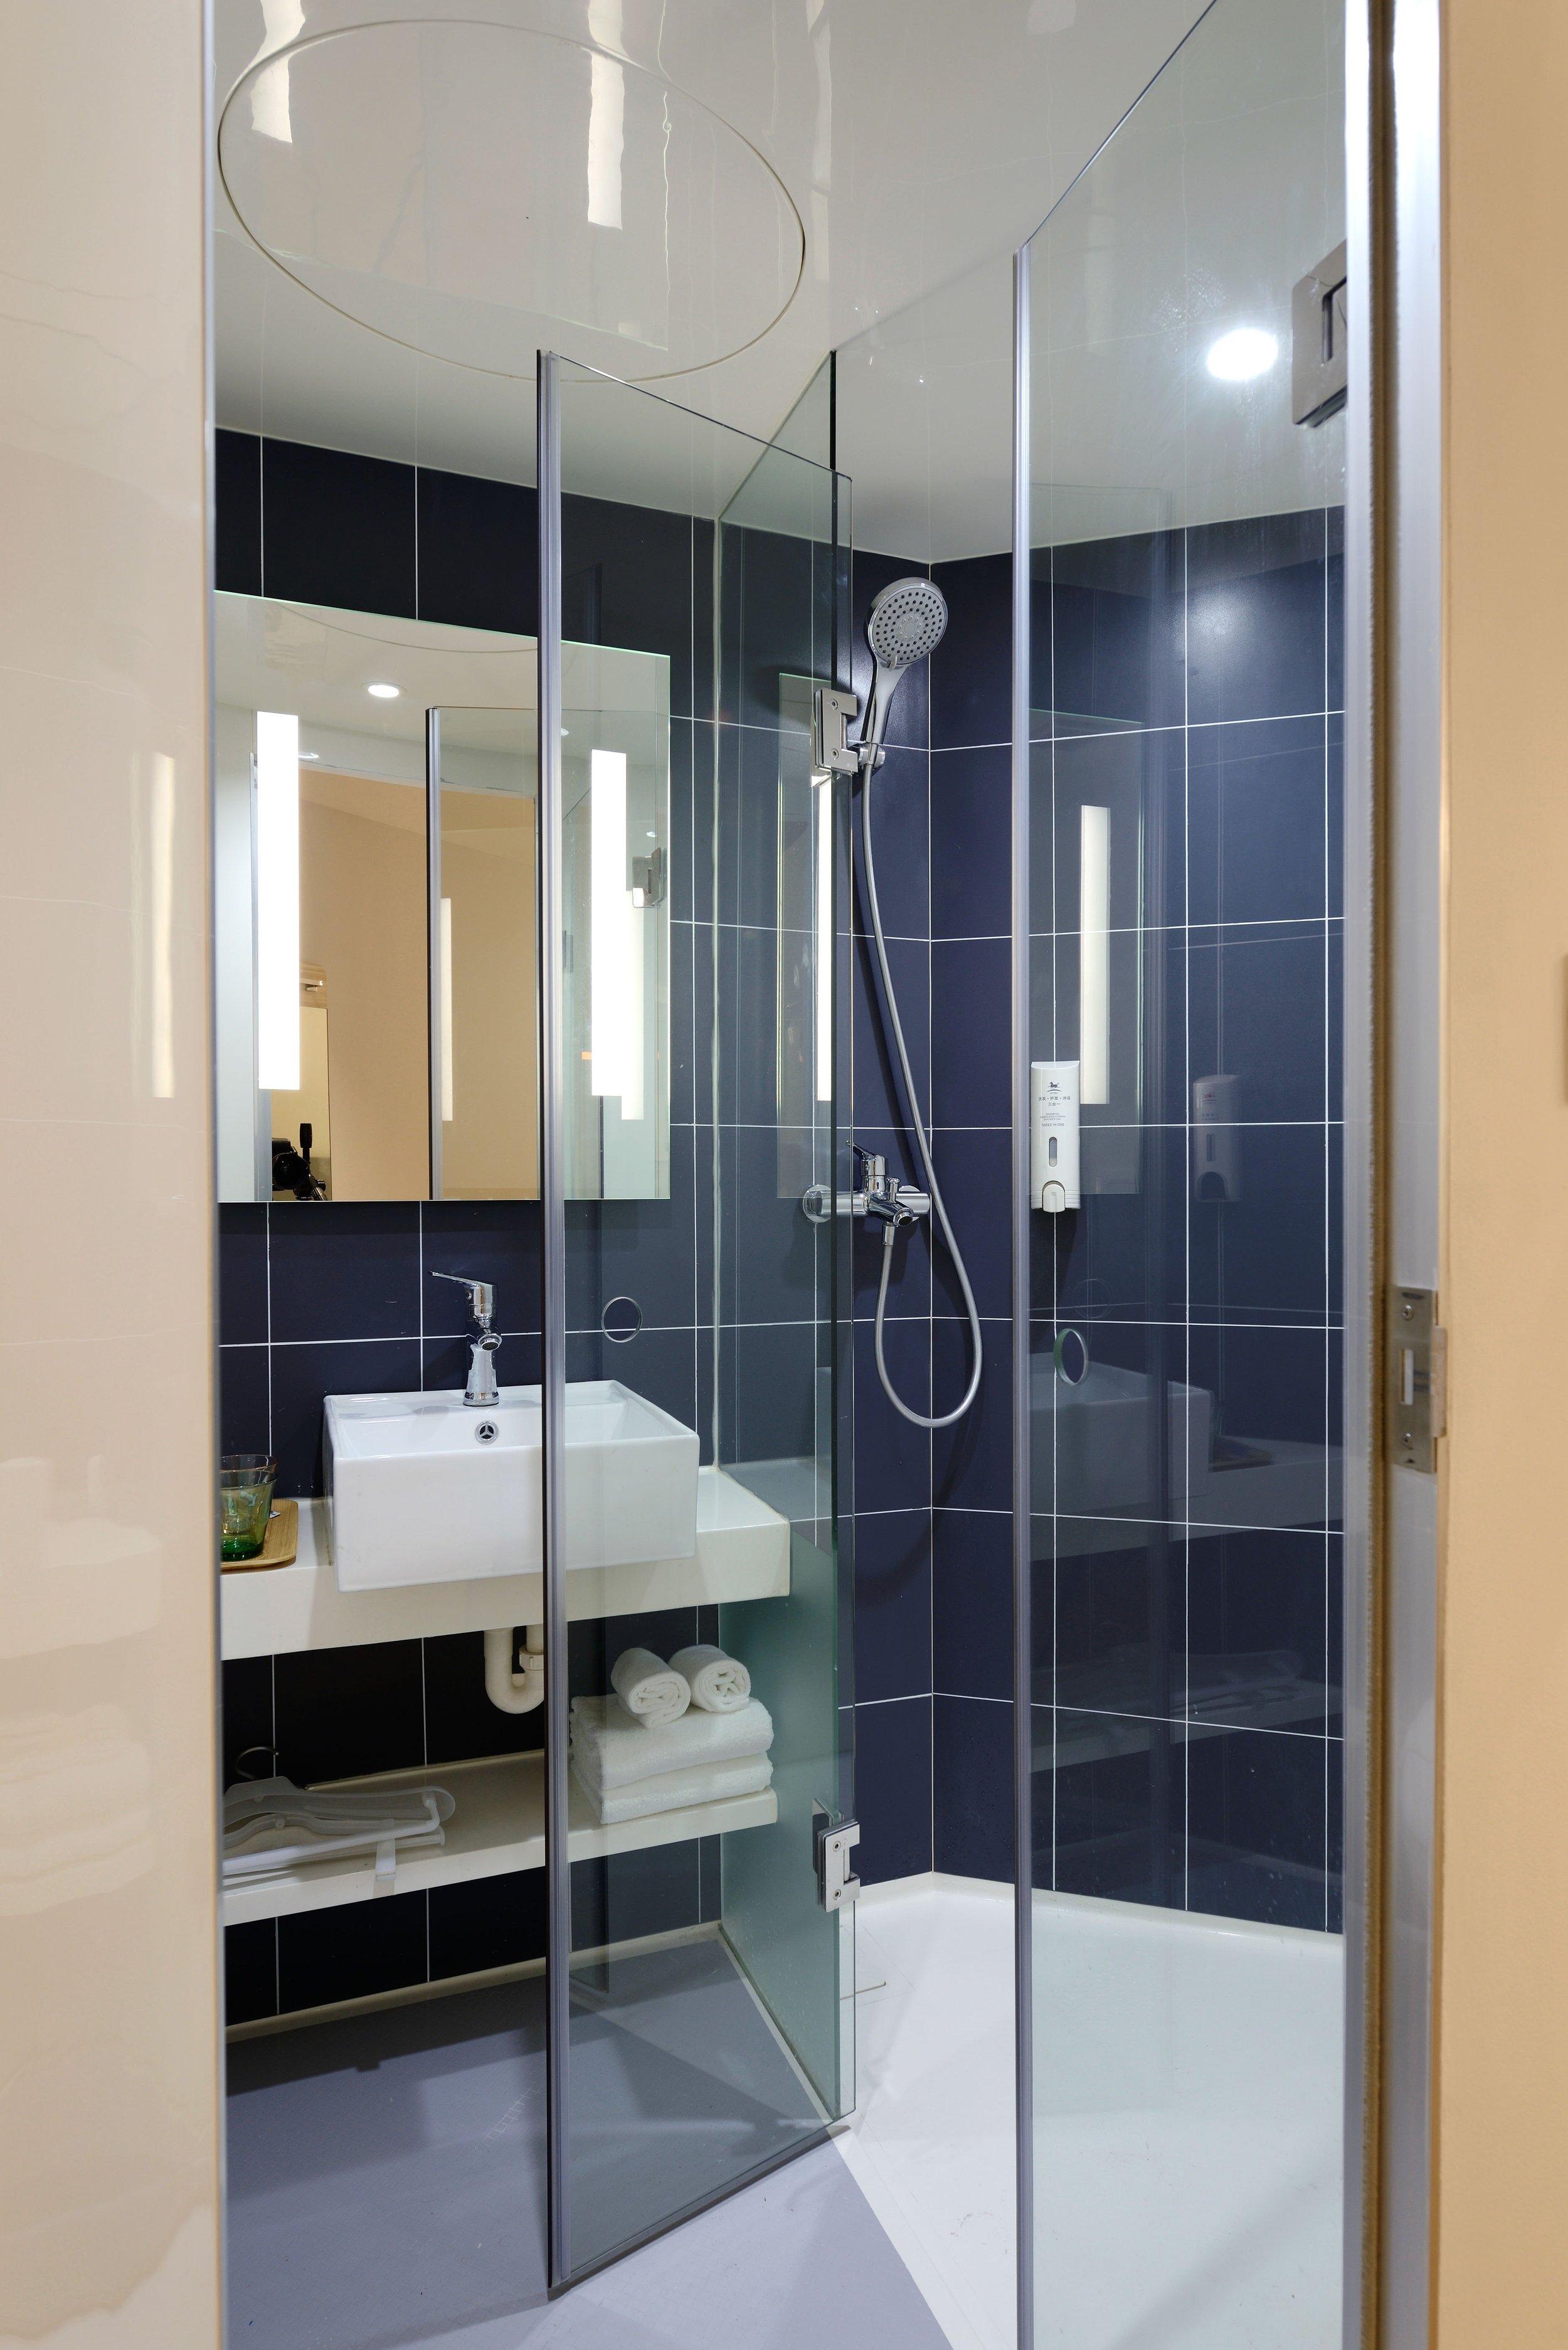 apartment-architecture-bath-towels-271631.jpg